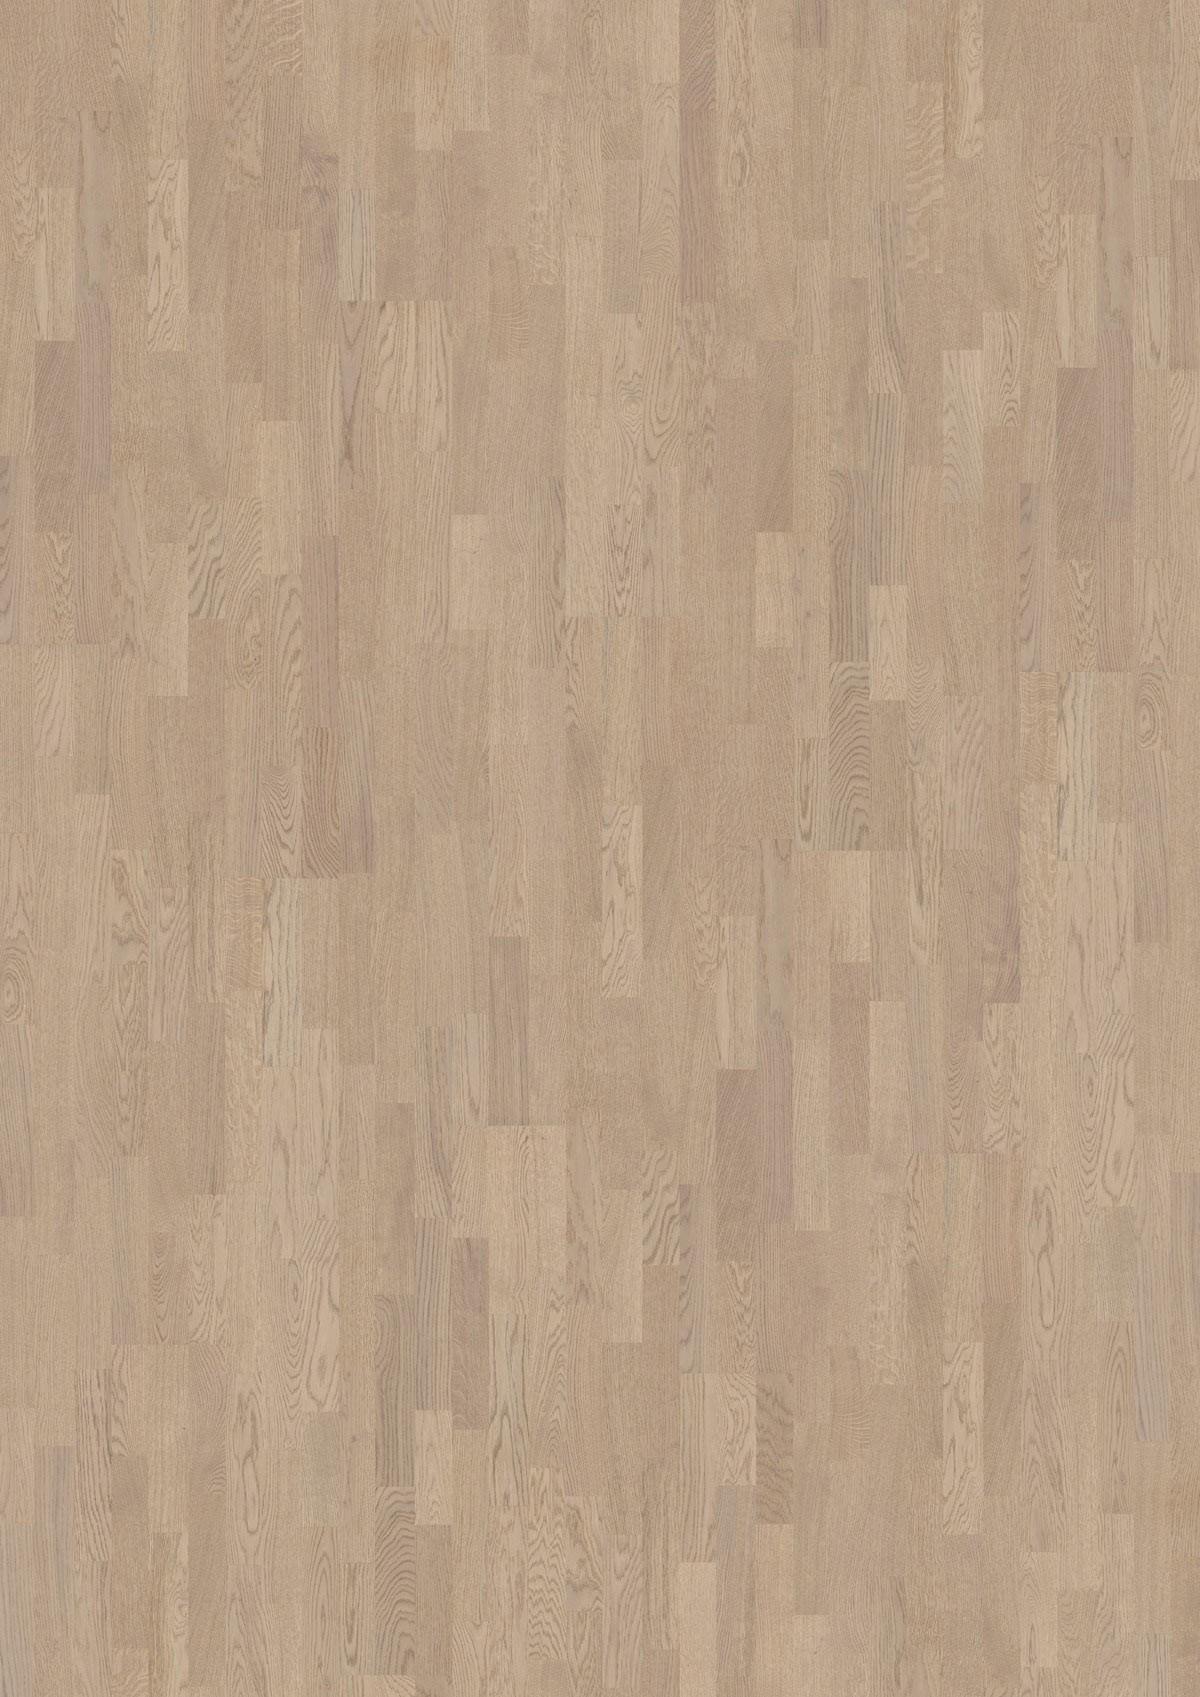 KAHRS Lumen Collection Oak Twilight Ultra Matt Lacquer  Swedish Engineered  Flooring 200mm - CALL FOR PRICE